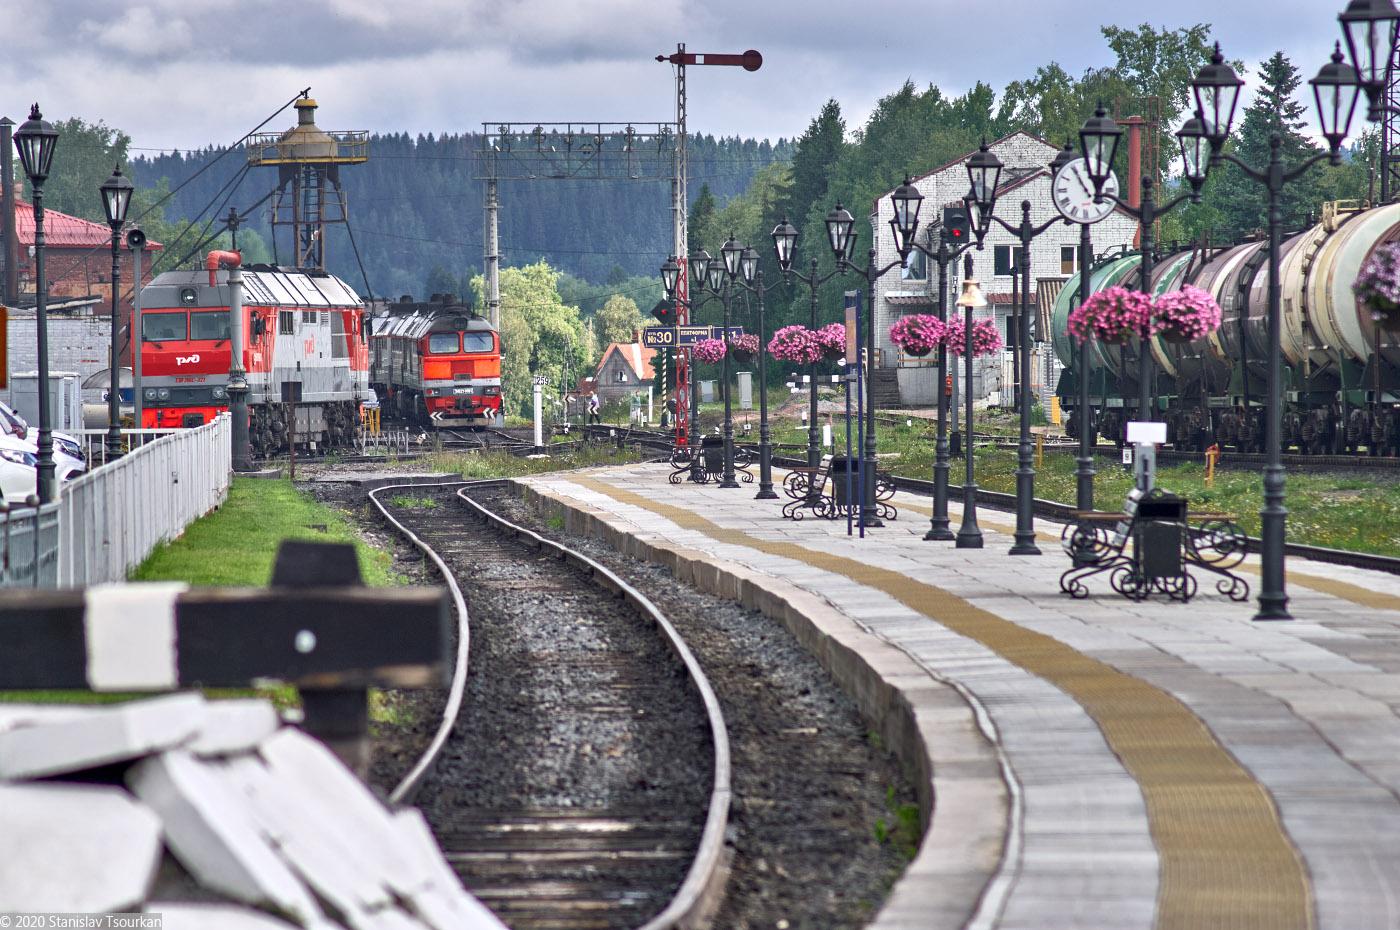 Карелия, республика Карелия, Сортавала, russia, karjala, sortavala, станция сортавала, железная дорога